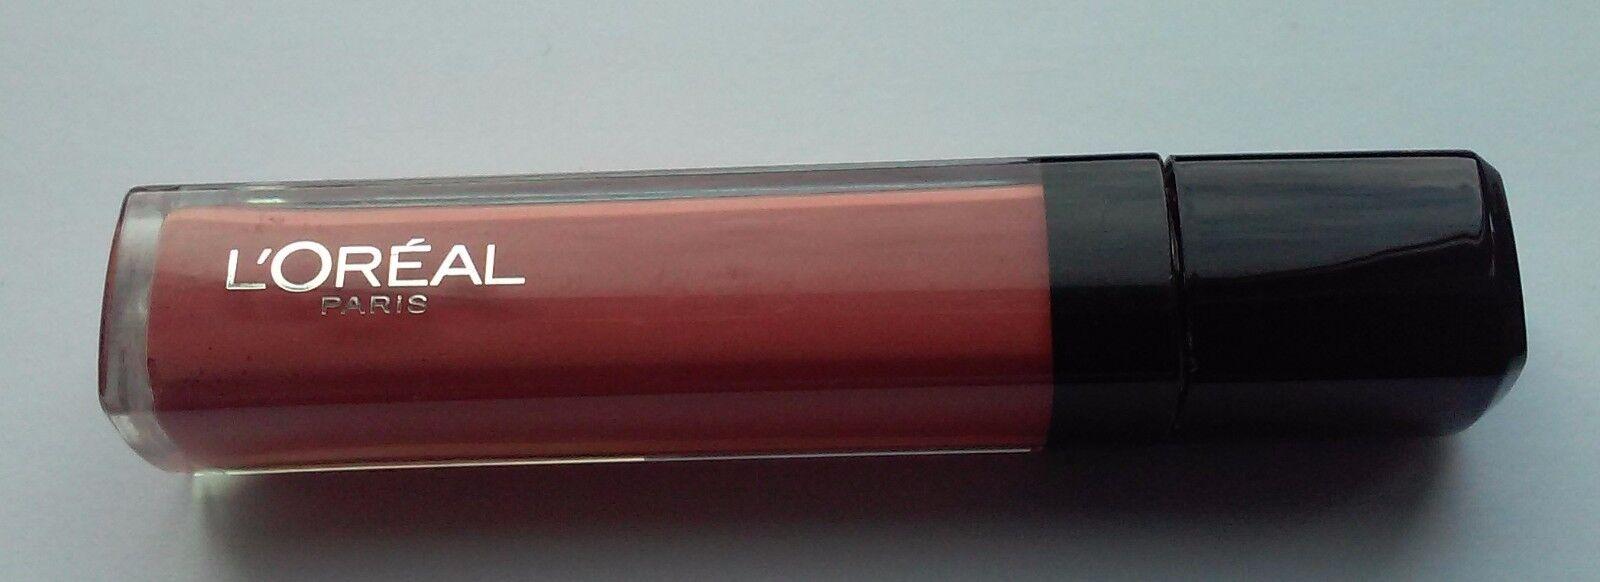 L'oreal Paris Infallible Mega Lip Gloss - 401 Amen